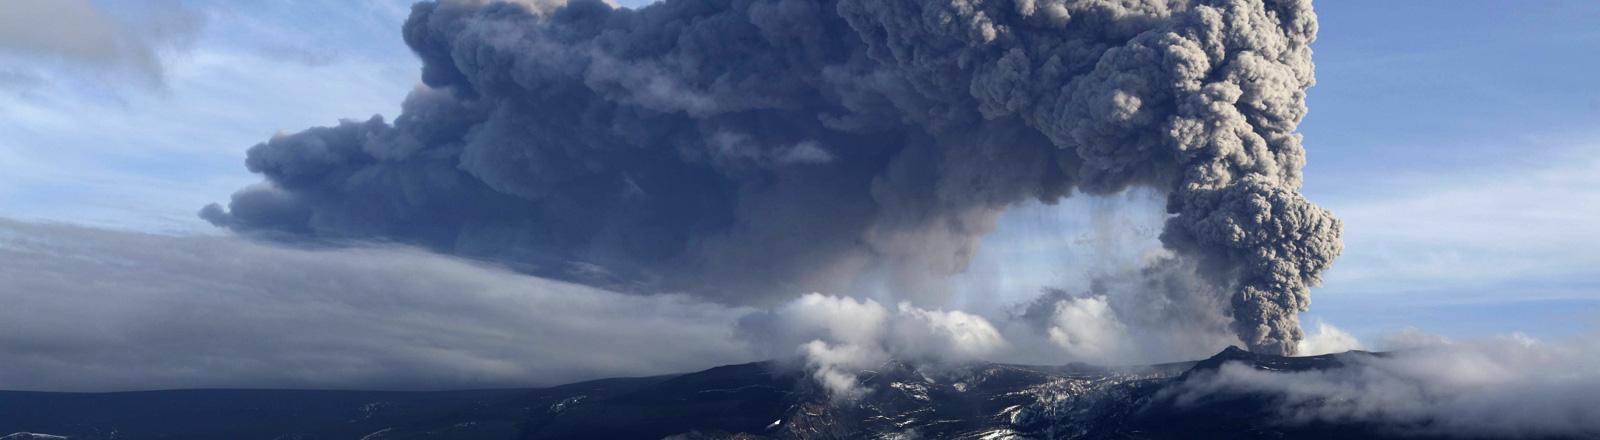 Beim Ausbruch des Vulkans Eyjafjallajökull 2010 hängt eine riesige Aschewolke über dem Vulkan.